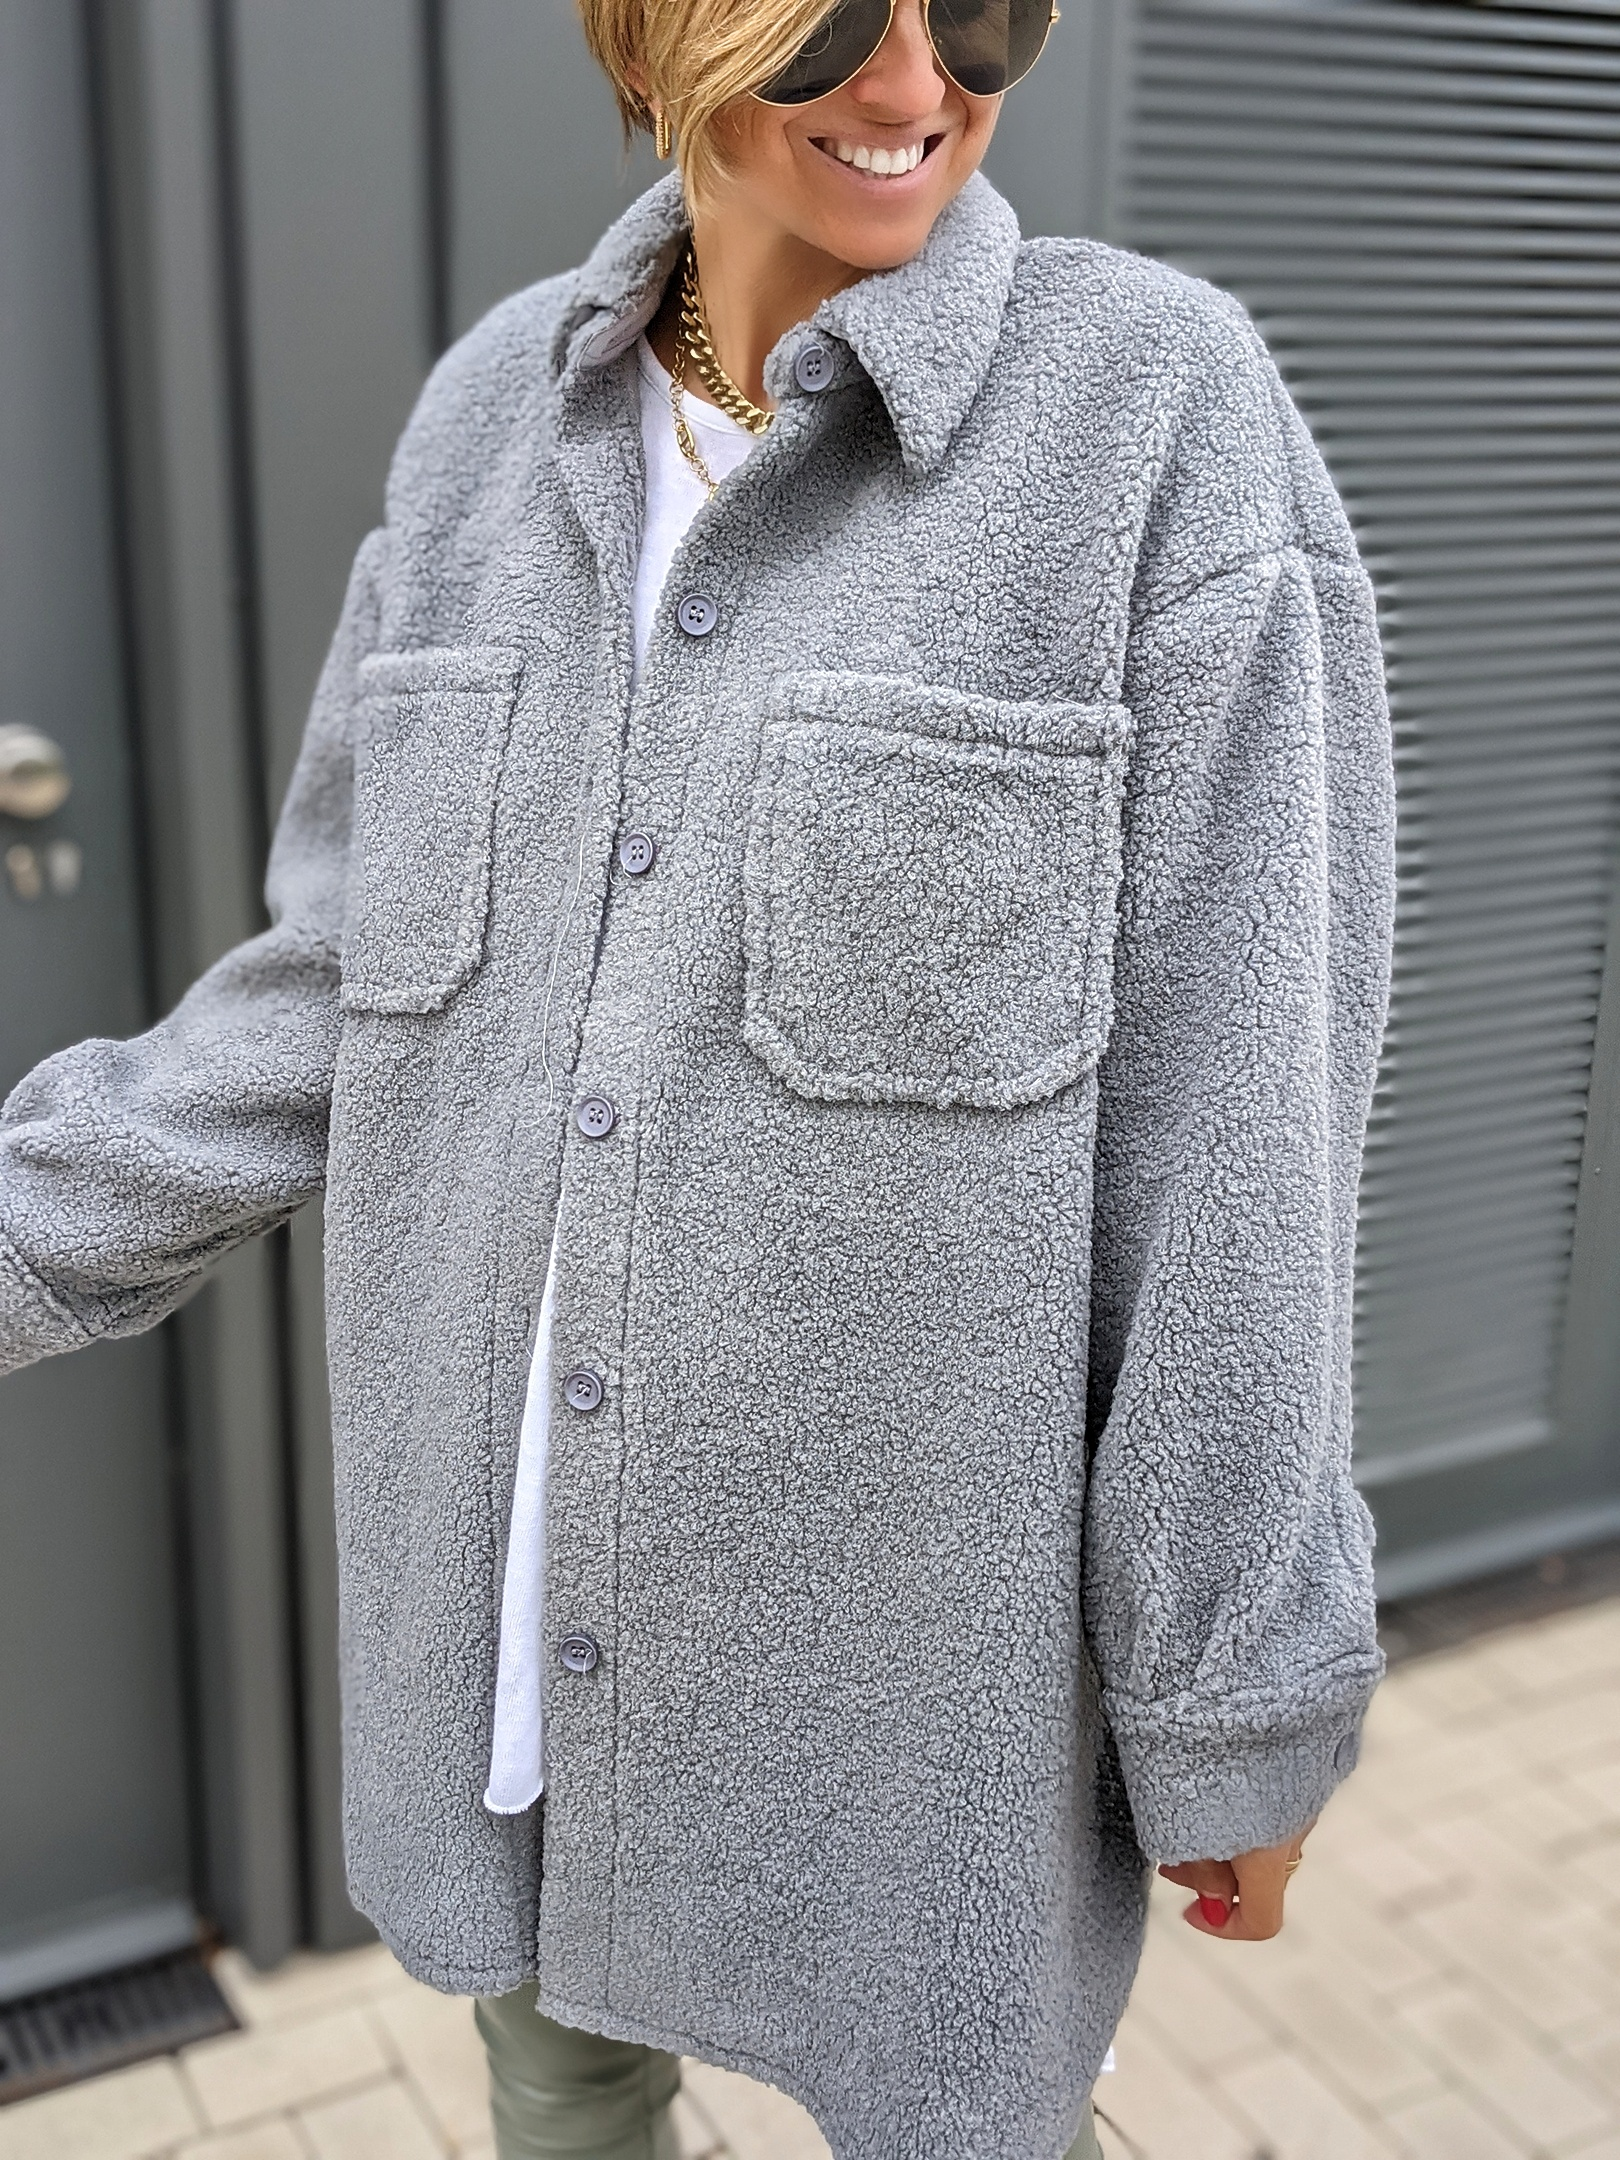 Oversize Hemdjacke SHEEP THRILLS-blau-grau